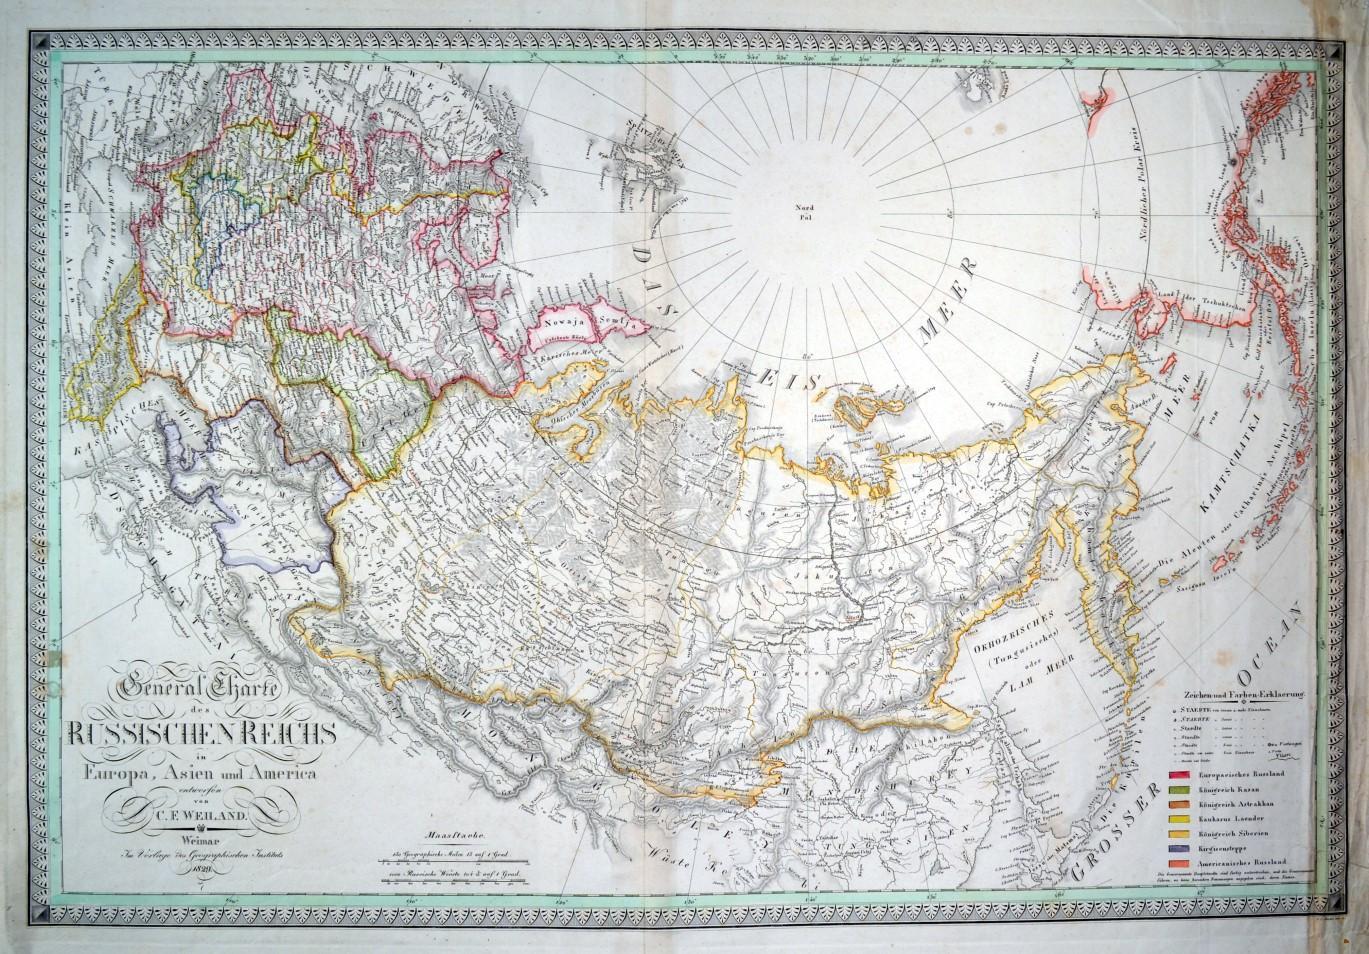 Karte Europa Asien.Russland Karte